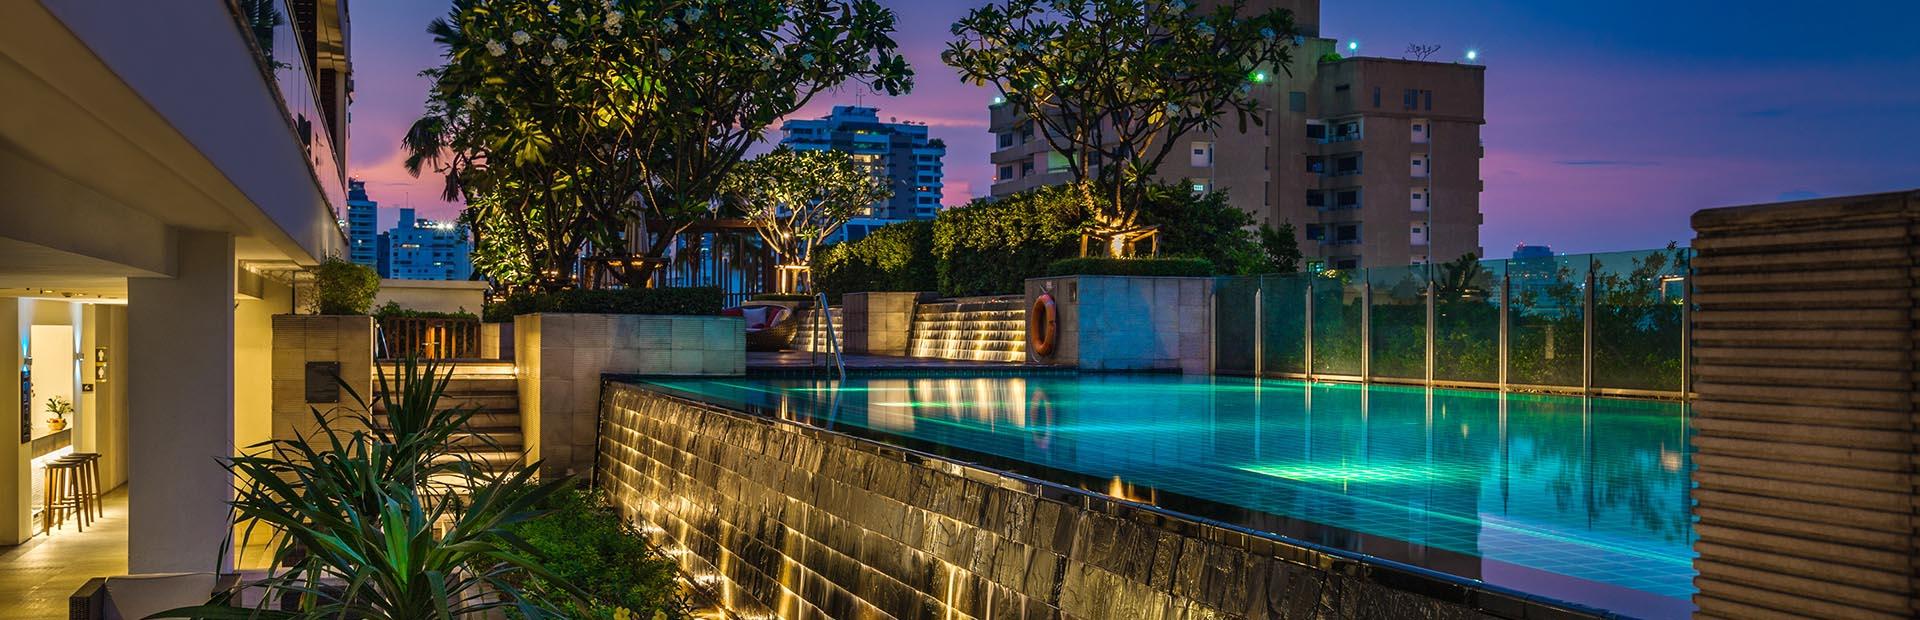 akyra Manor Chiang Mai - 5 Star luxury hotel in Chiang Mai